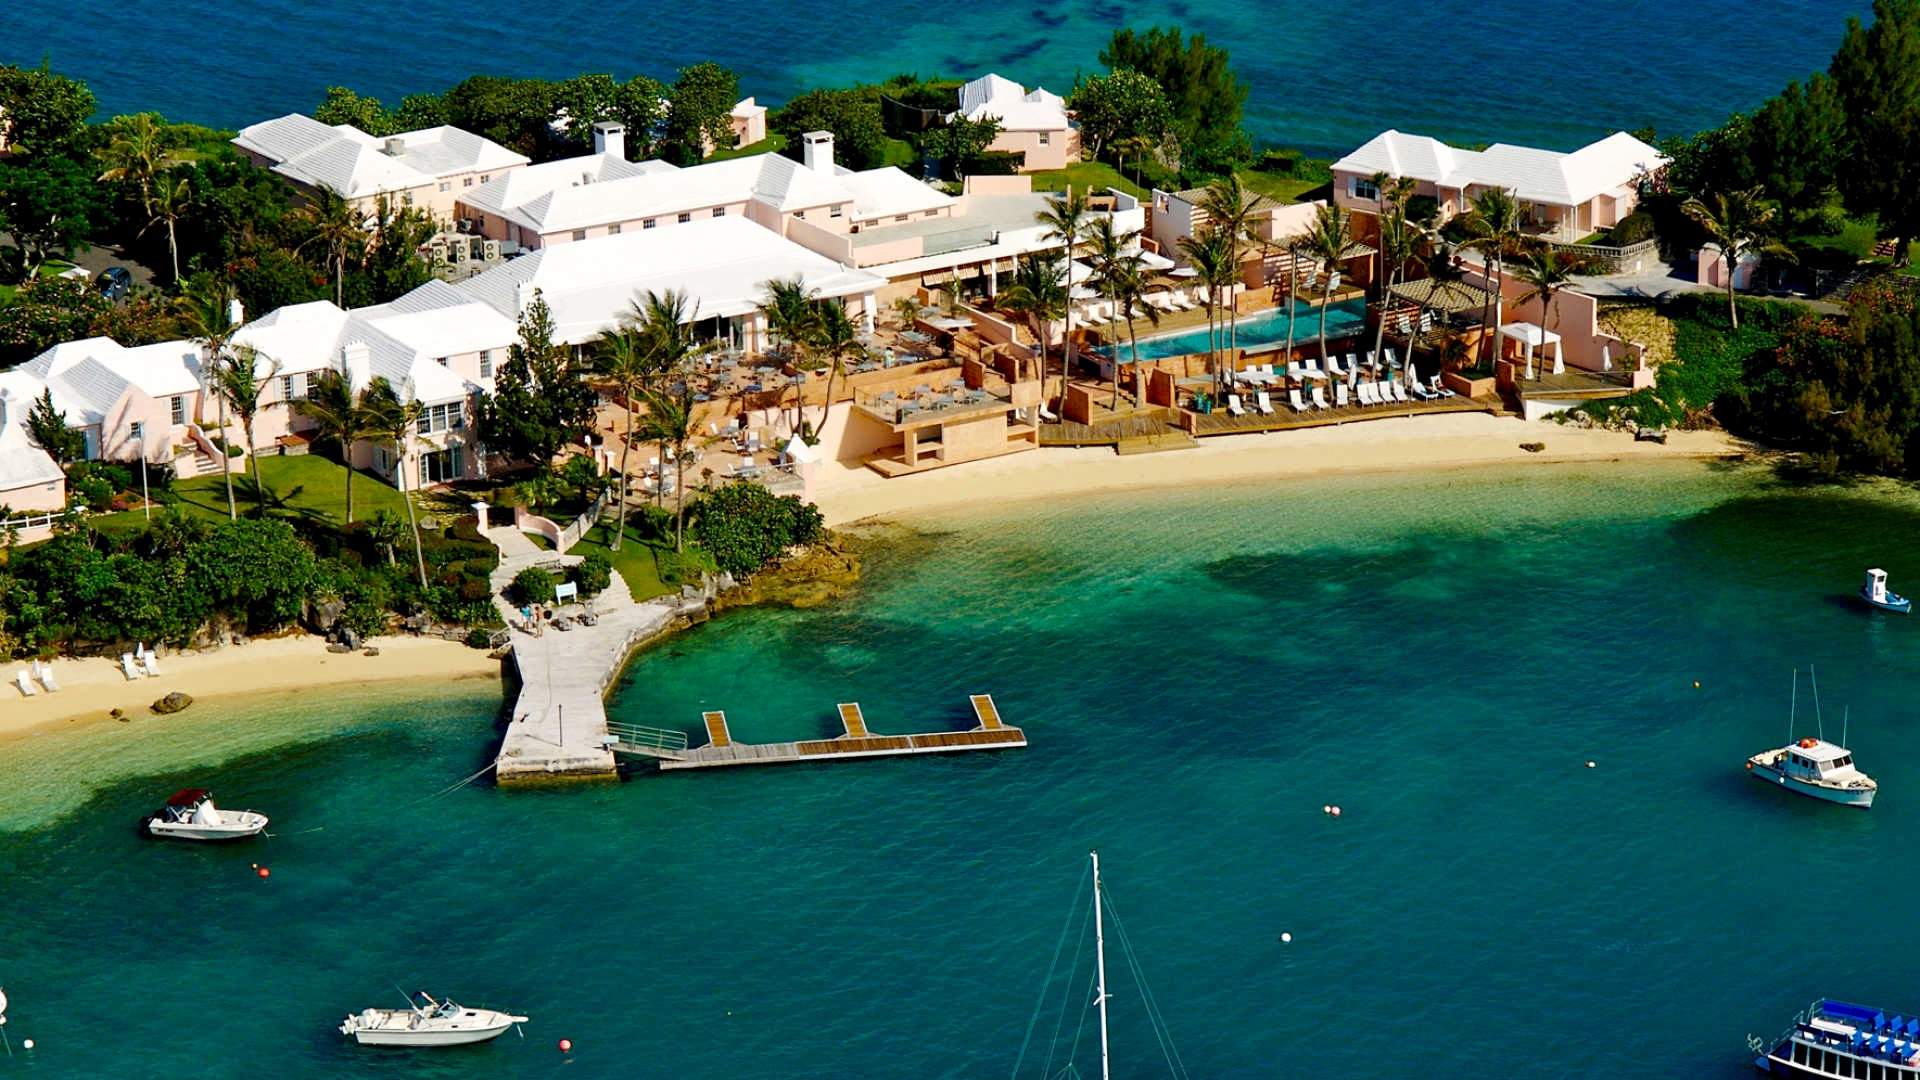 Grotto Bay Beach Resort Bermuda Spas of America  Spas of